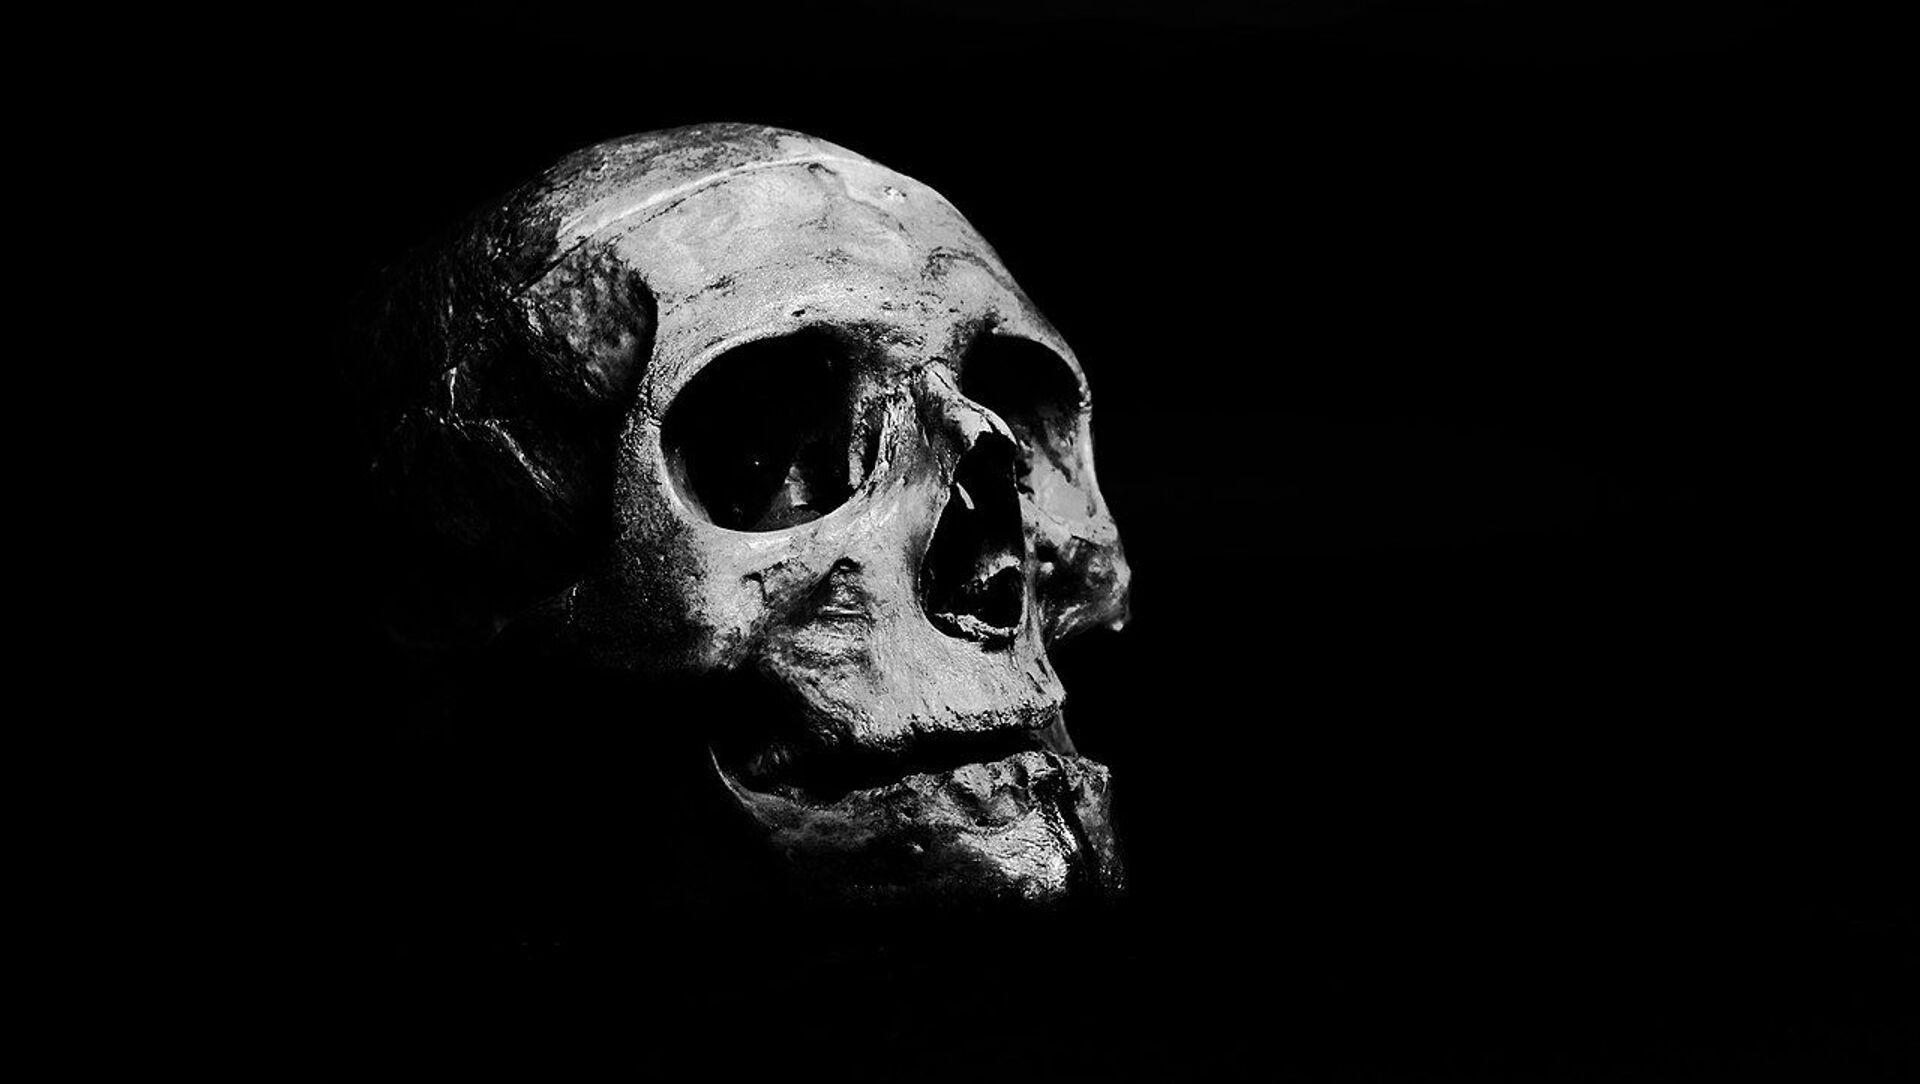 Skull on grayscale - Sputnik International, 1920, 25.08.2021